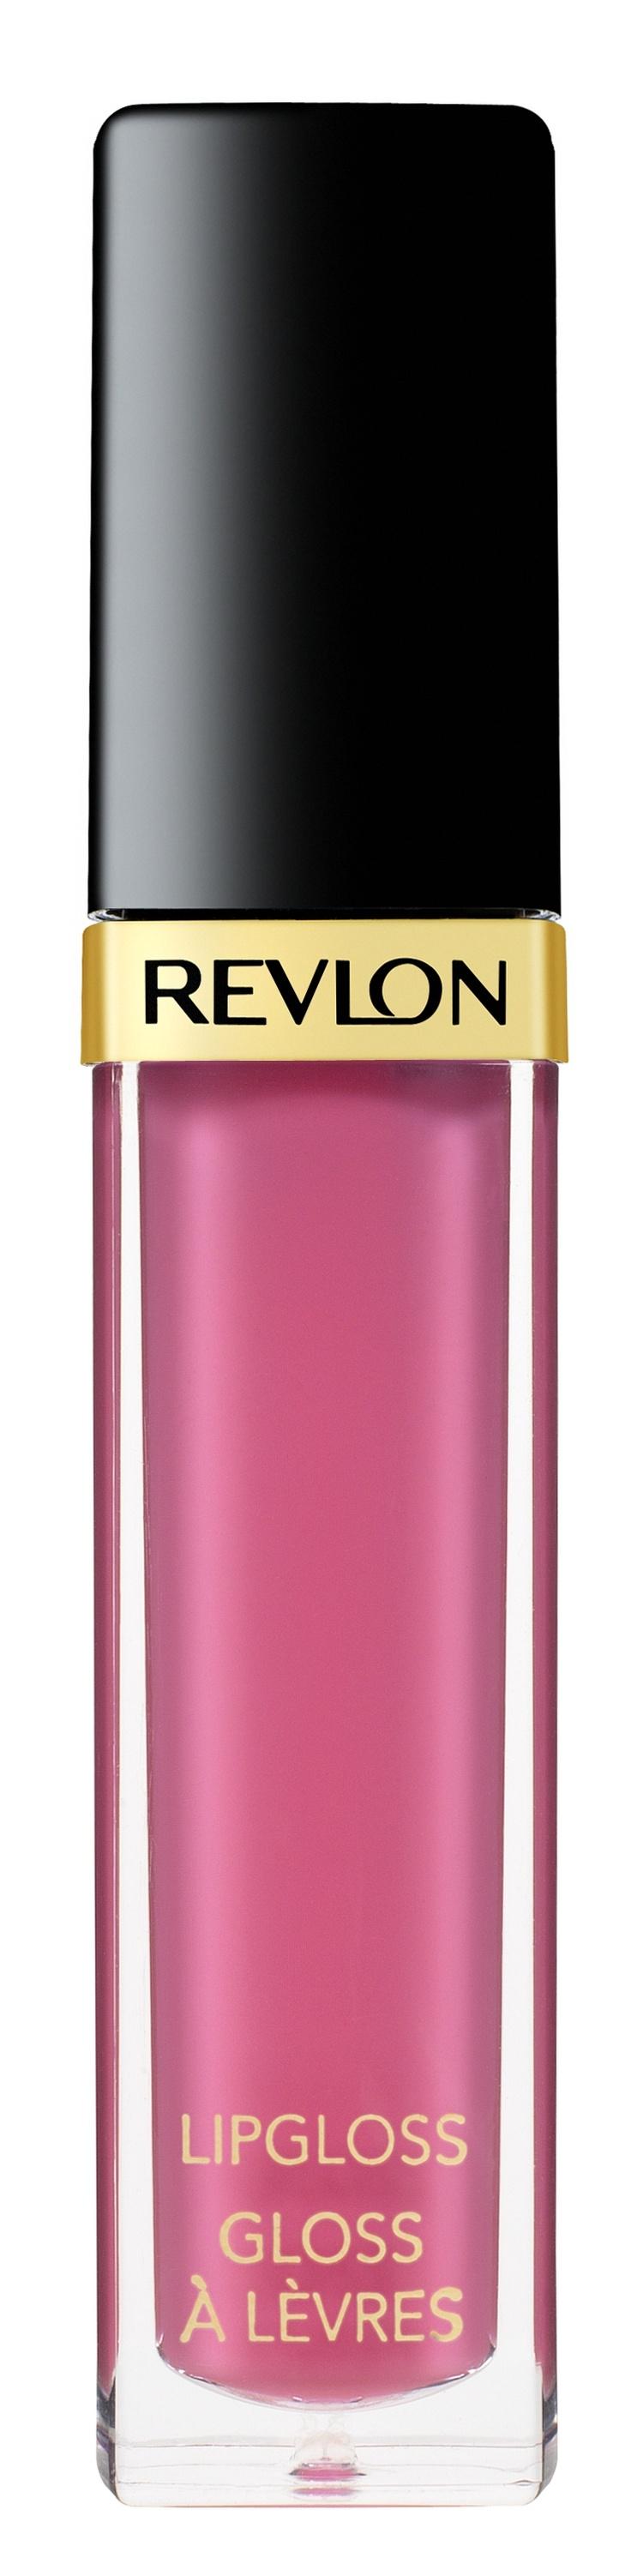 Revlon Super Lustrous Lipgloss in Pink Pop